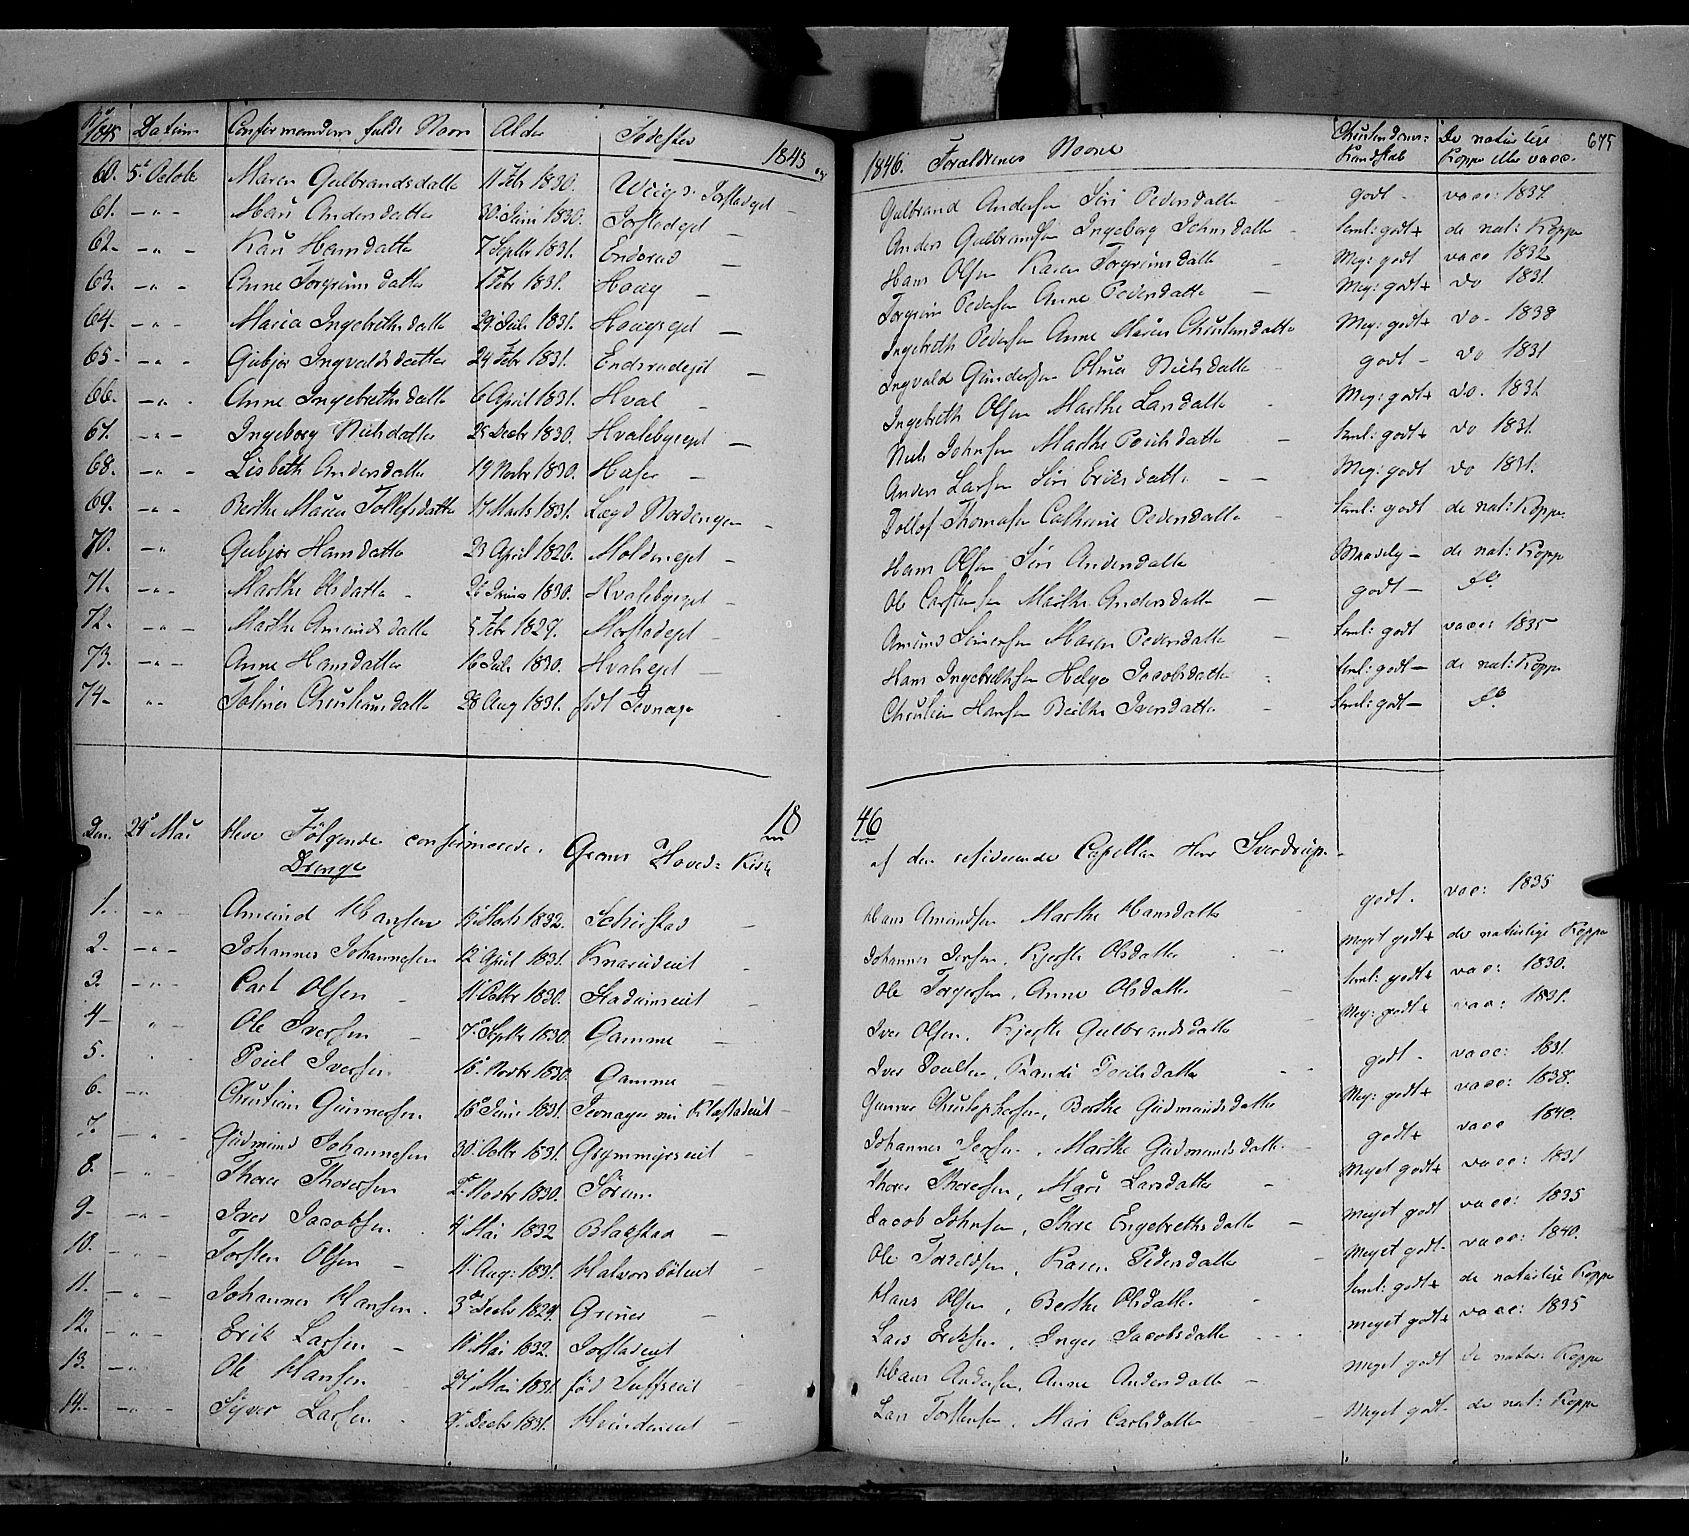 SAH, Gran prestekontor, Ministerialbok nr. 11, 1842-1856, s. 674-675